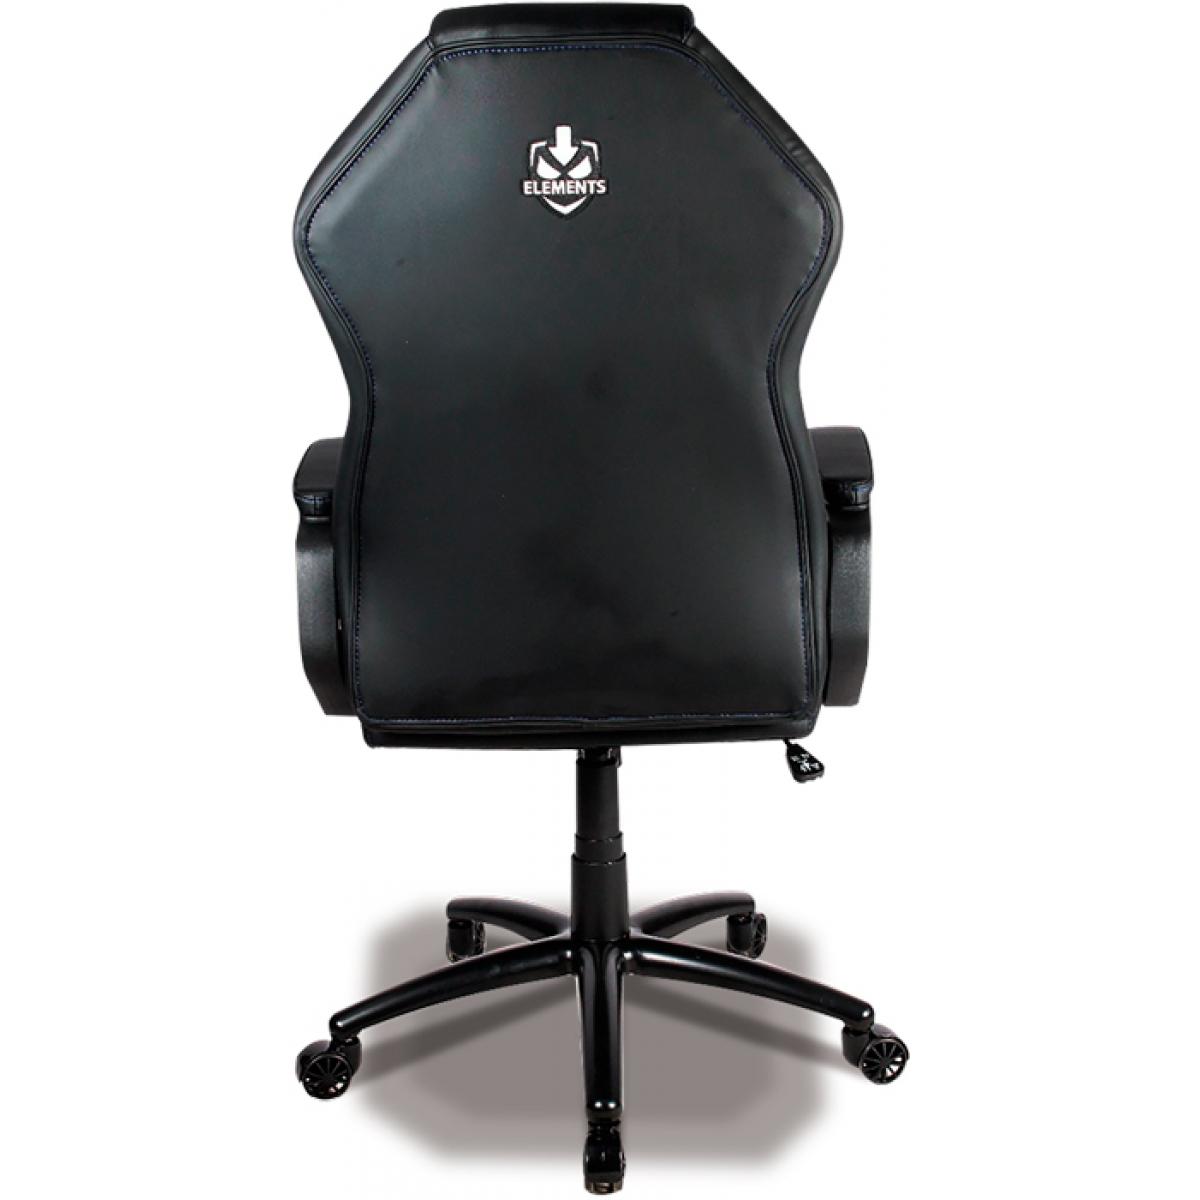 Cadeira Gamer Elements Elemental Terra, Green